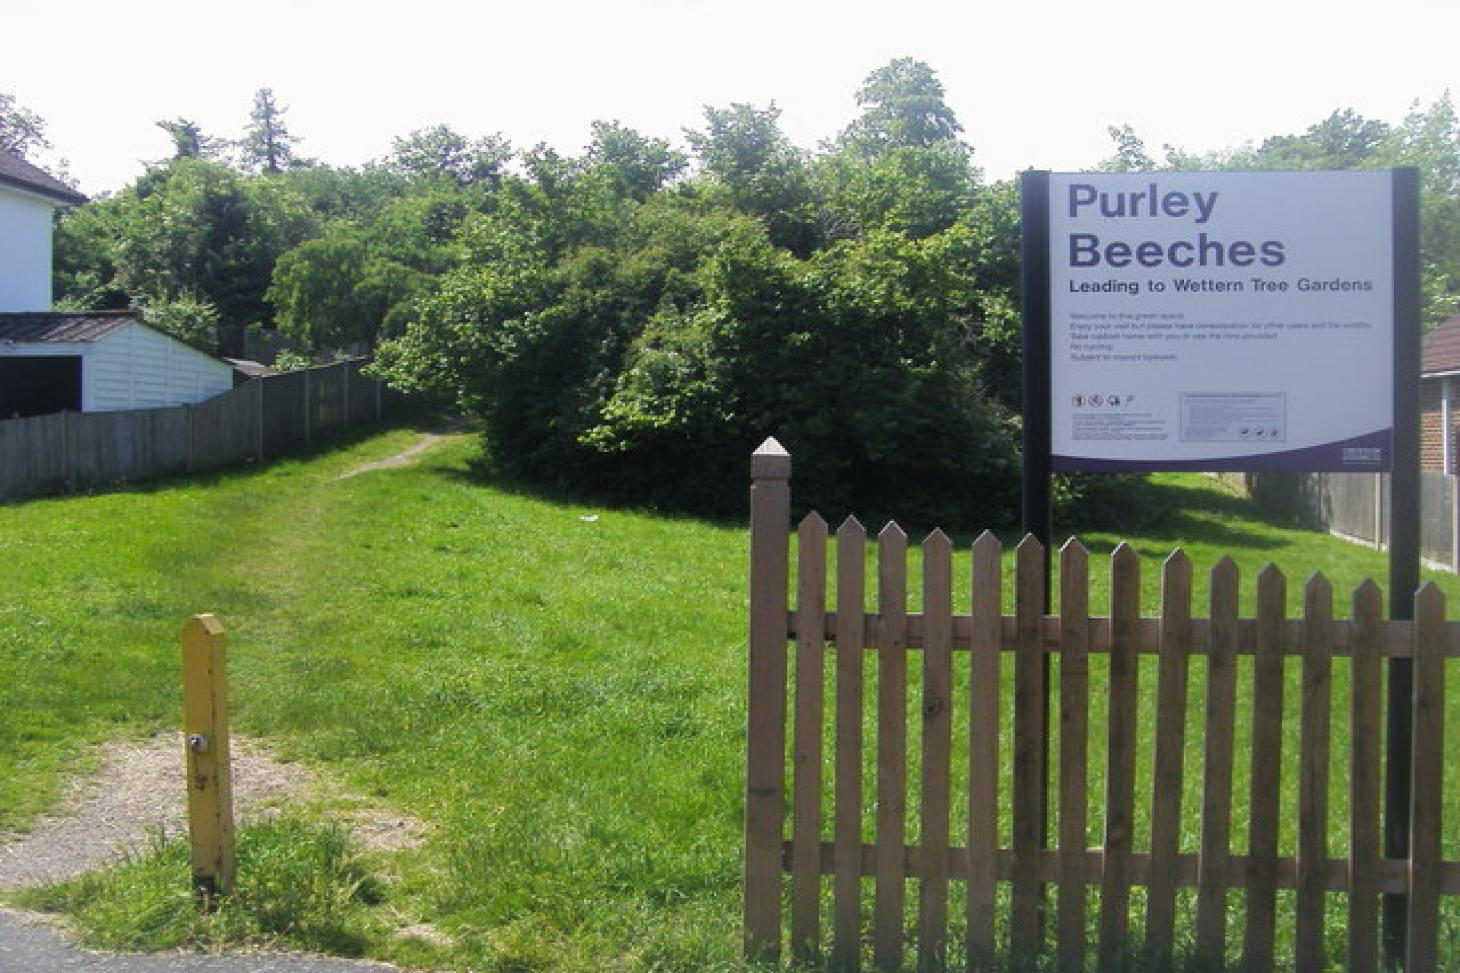 Purley Beeches Park Outdoor | Hard (macadam) tennis court